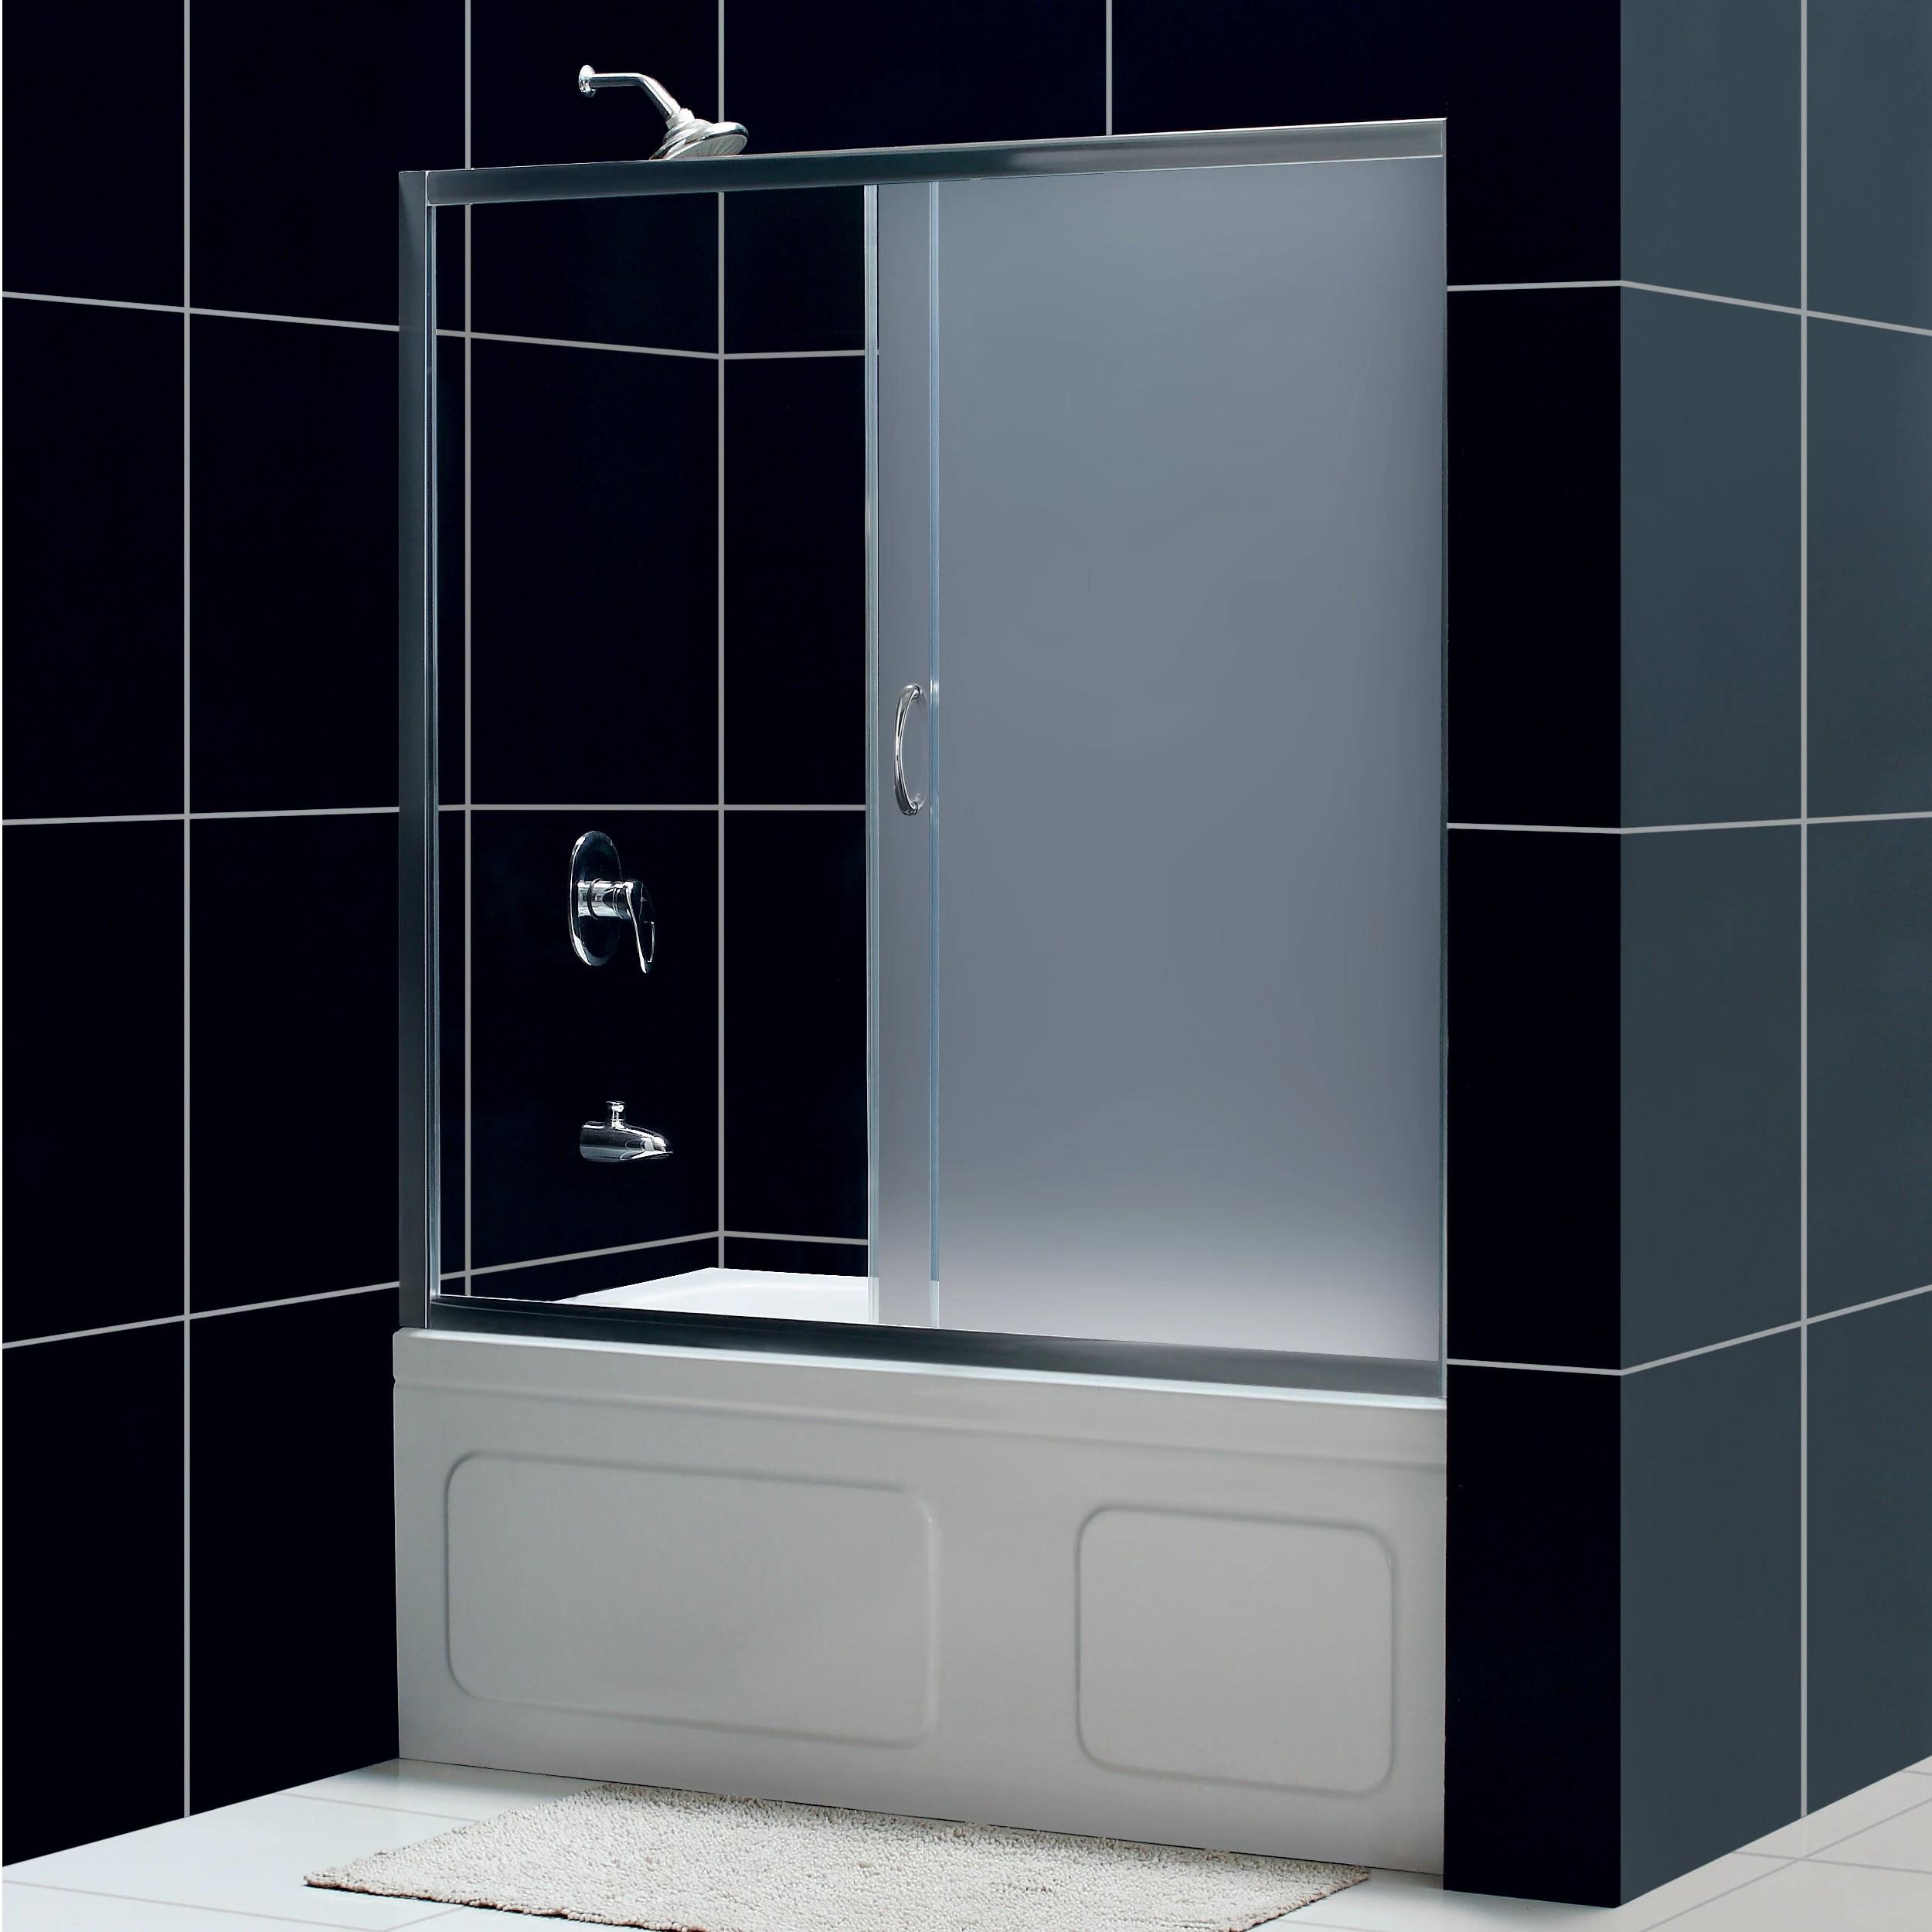 Dreamline Infinity 60 Inch Frosted Glass Tub Sliding Shower Door